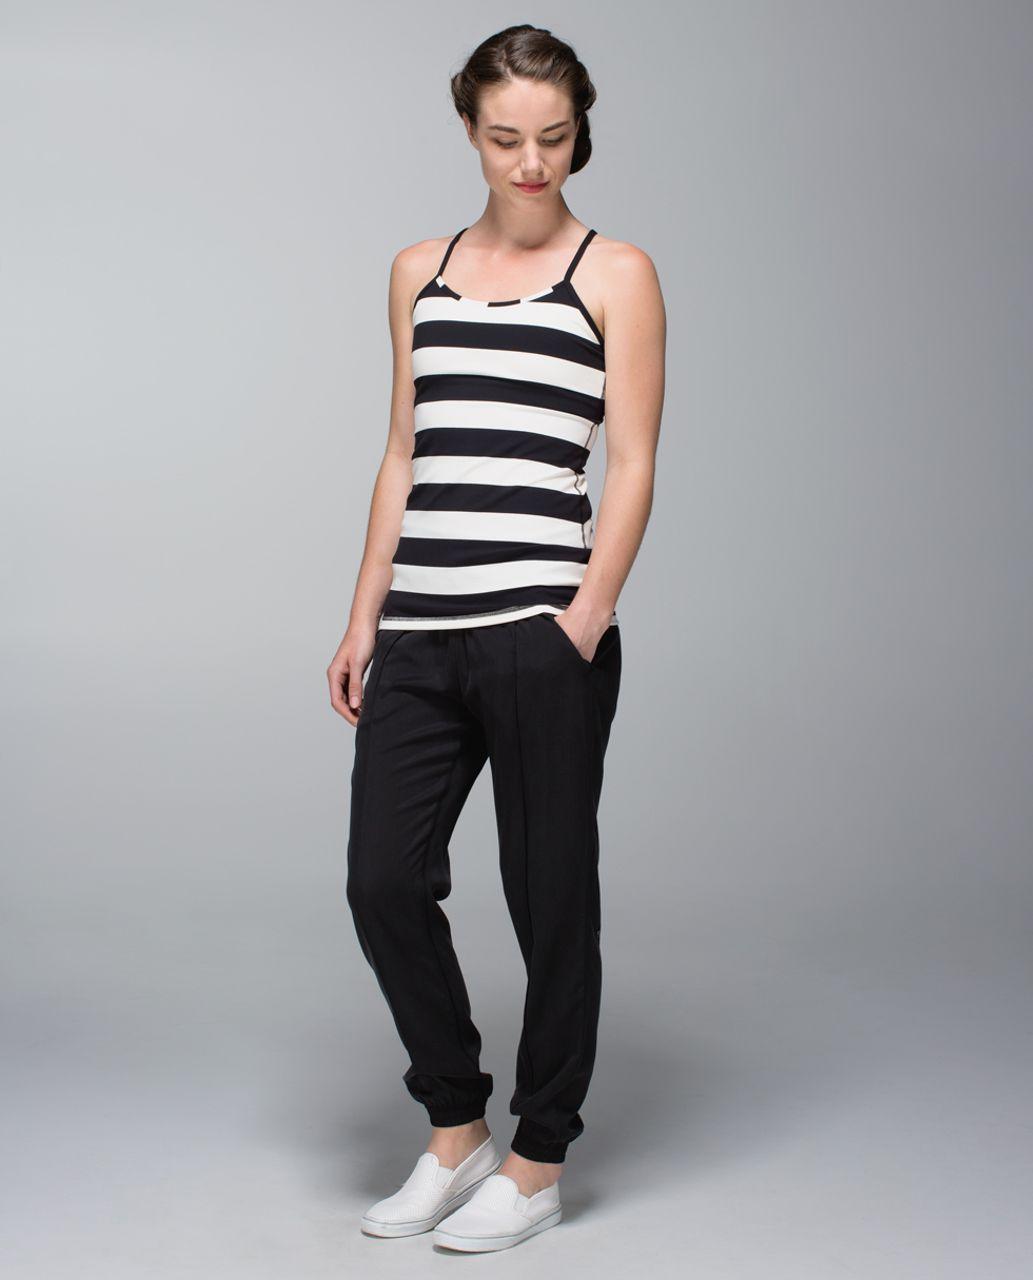 Lululemon Power Y Tank *Luon - Steep Stripe Black Horizontal / Black